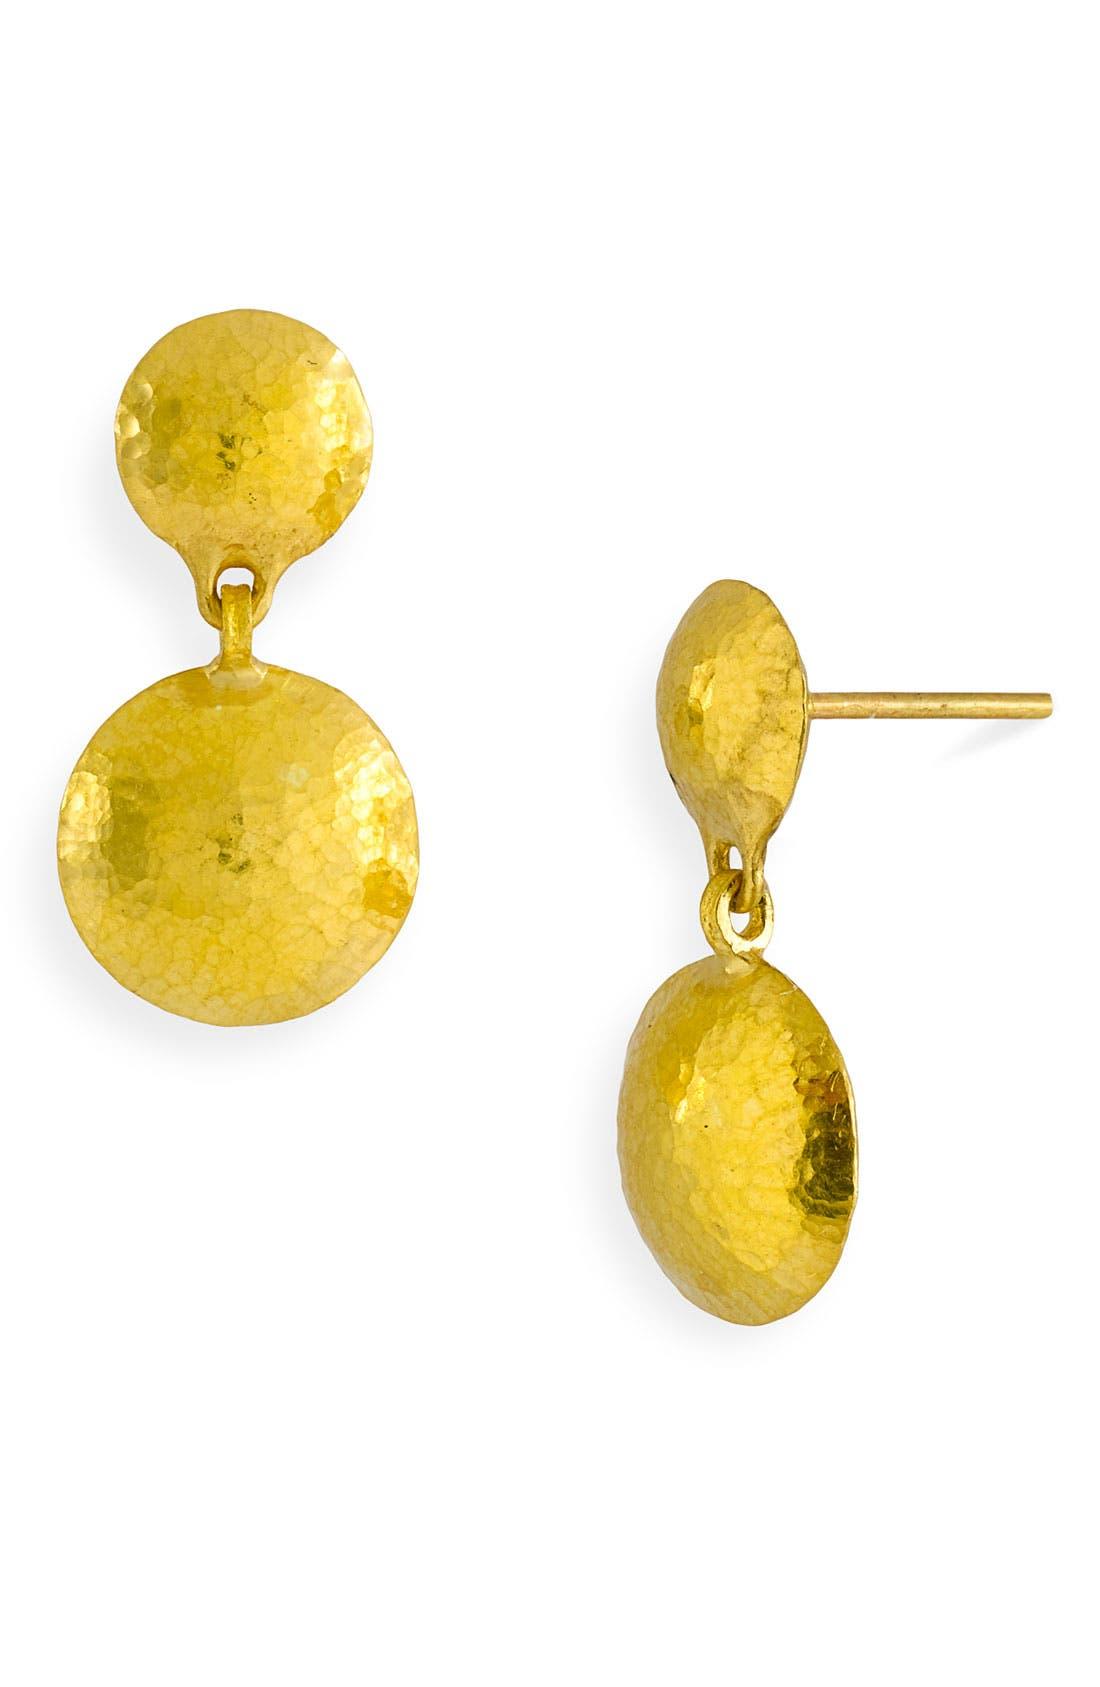 Alternate Image 1 Selected - Gurhan 'Lentil' Double Disc Drop Earrings